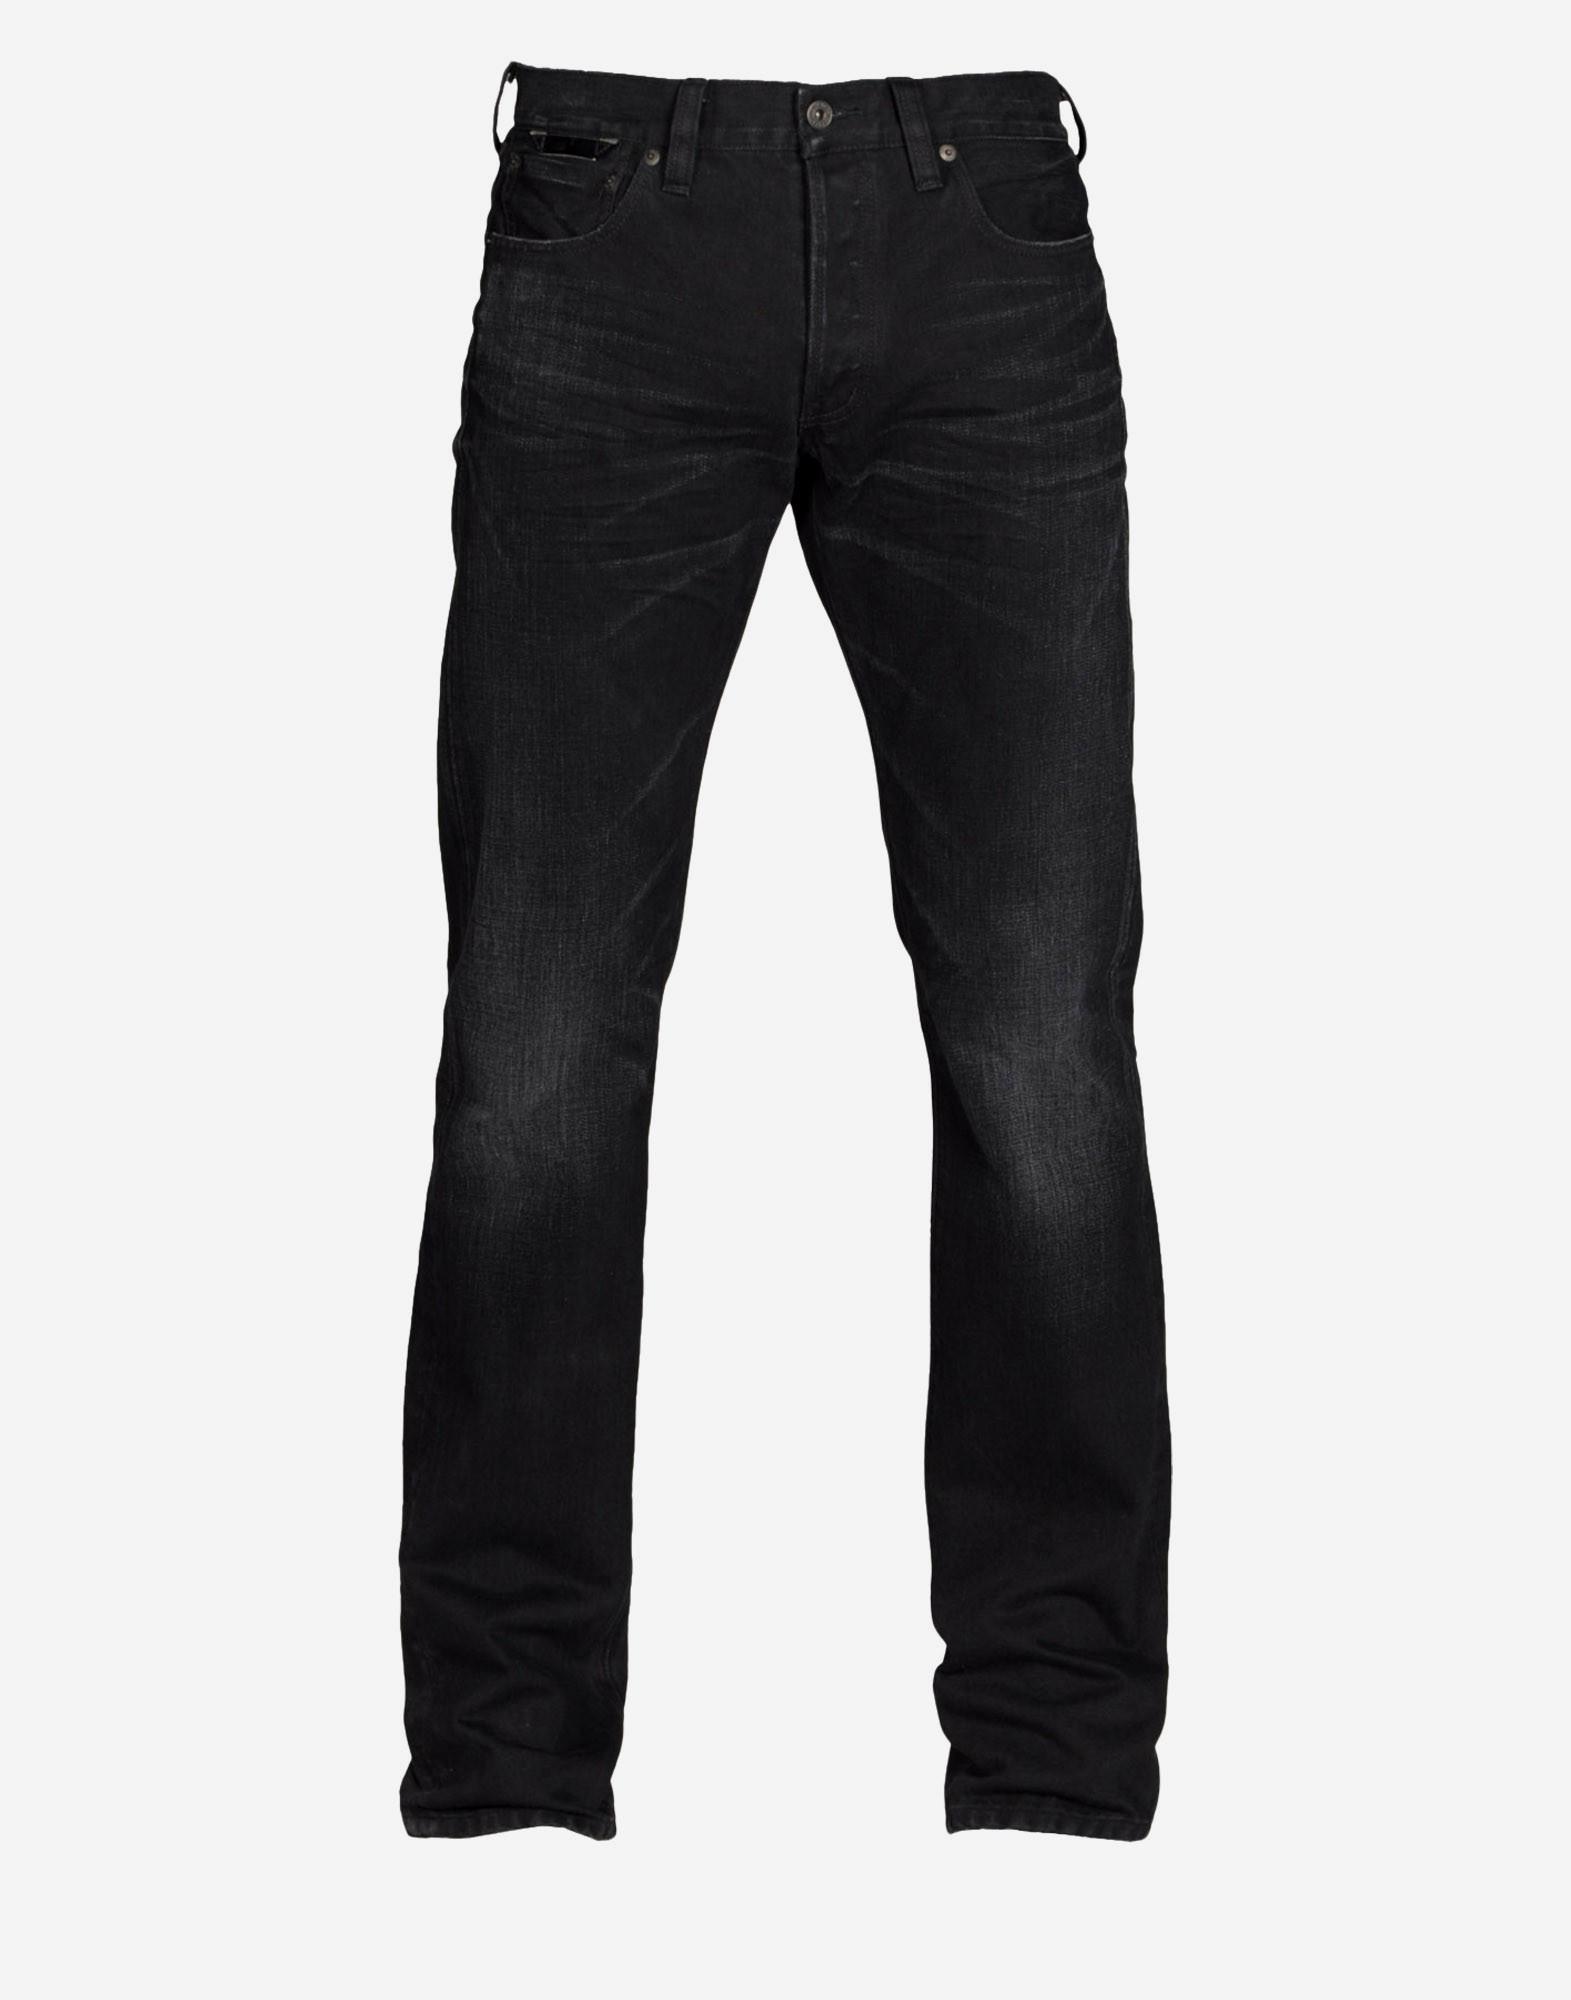 adidas denim jeans